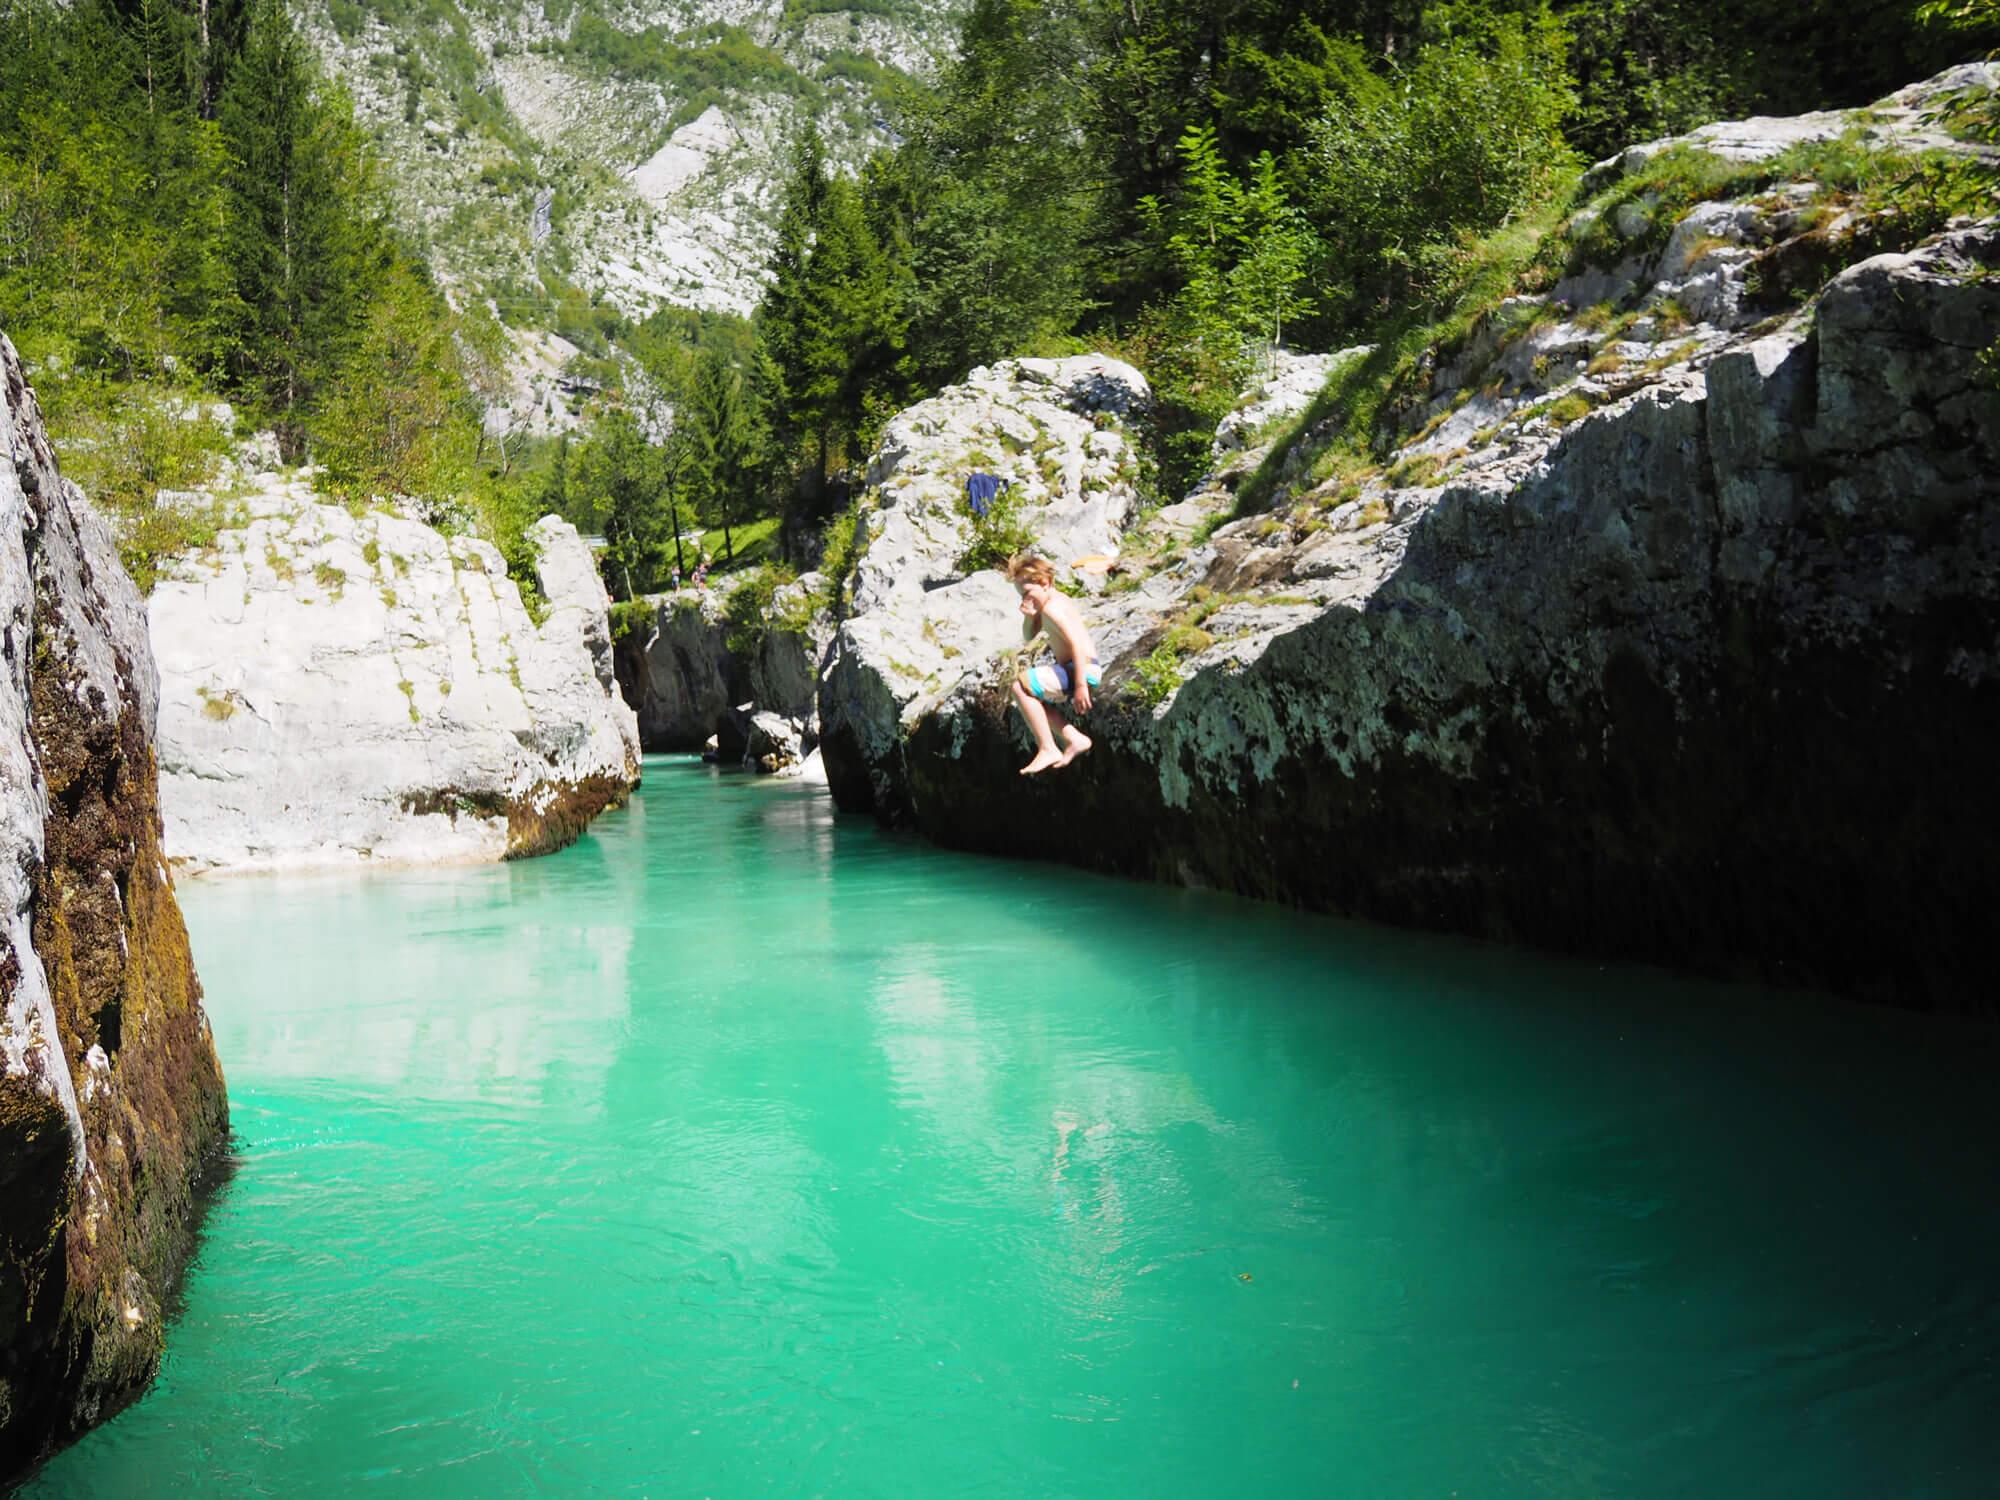 Gumpenspringen an der Soca I alpinonline